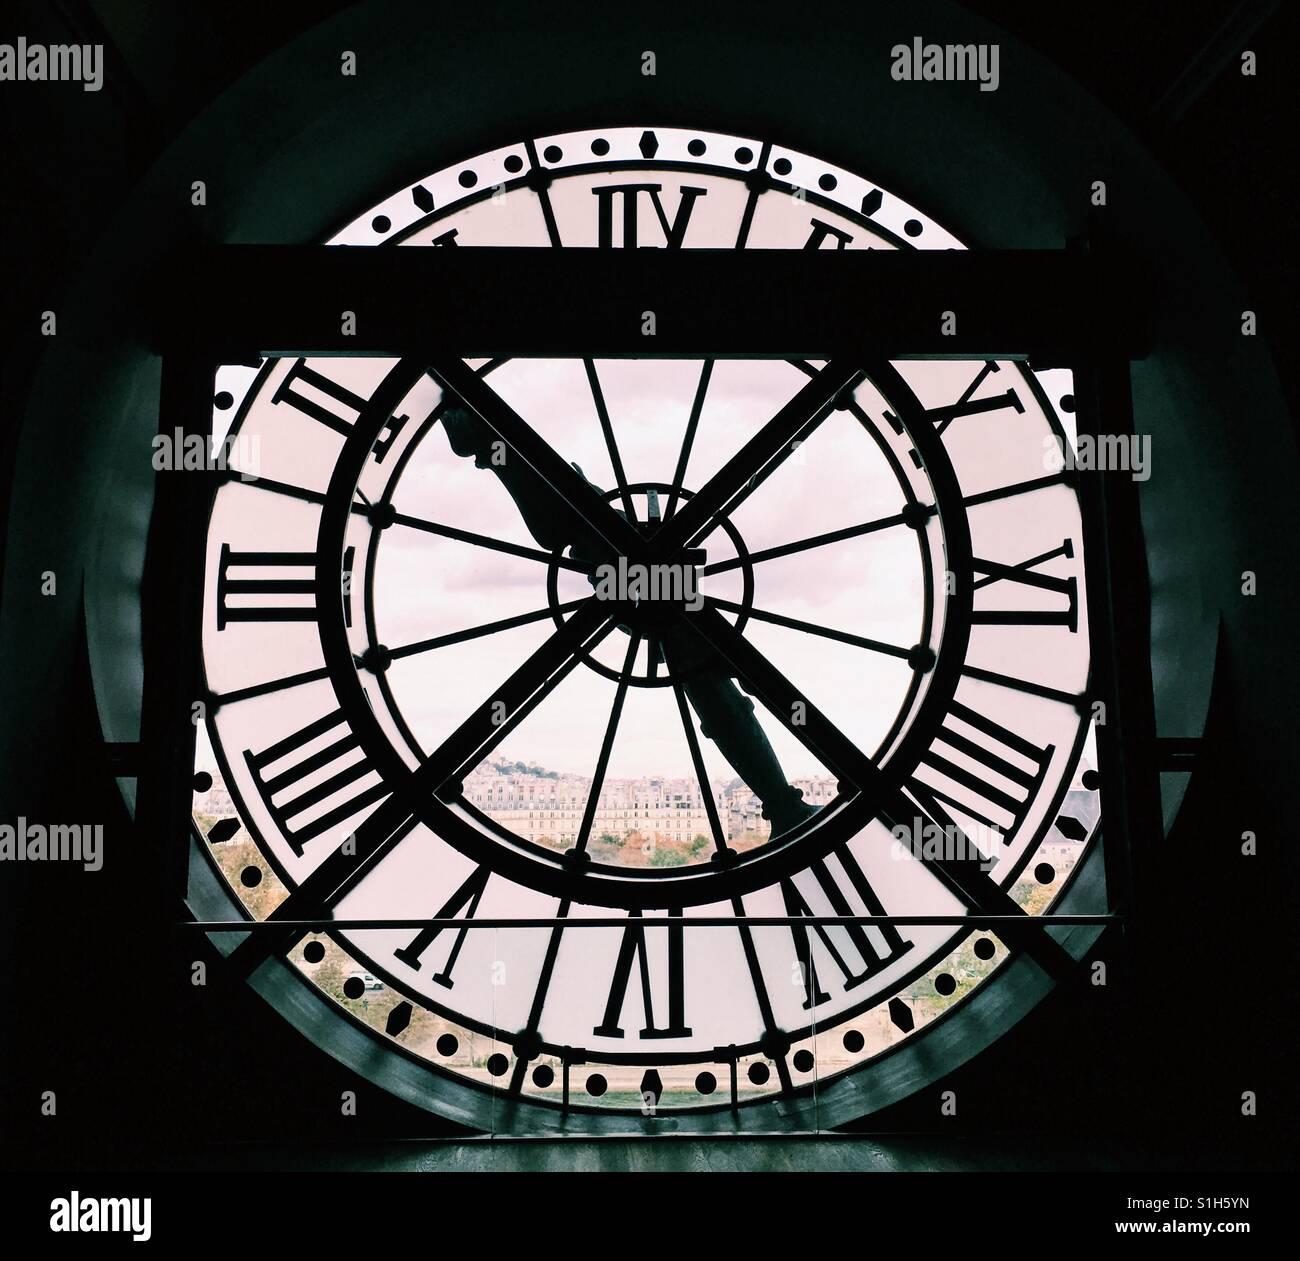 Time. Clock. Stock Photo